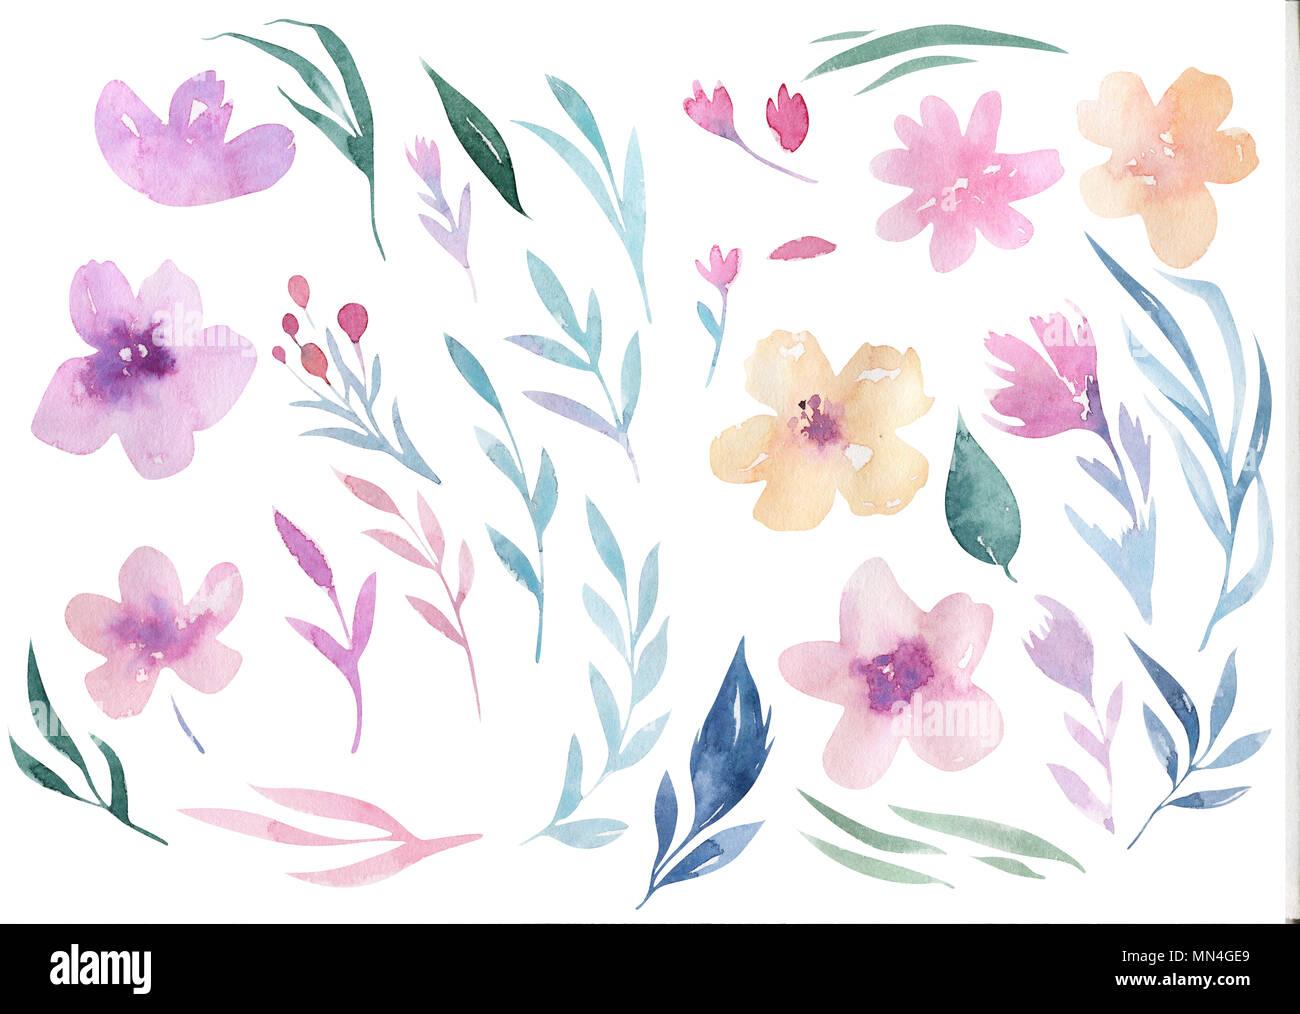 Watercolor Floral Boho Flower Wreath Imágenes De Stock